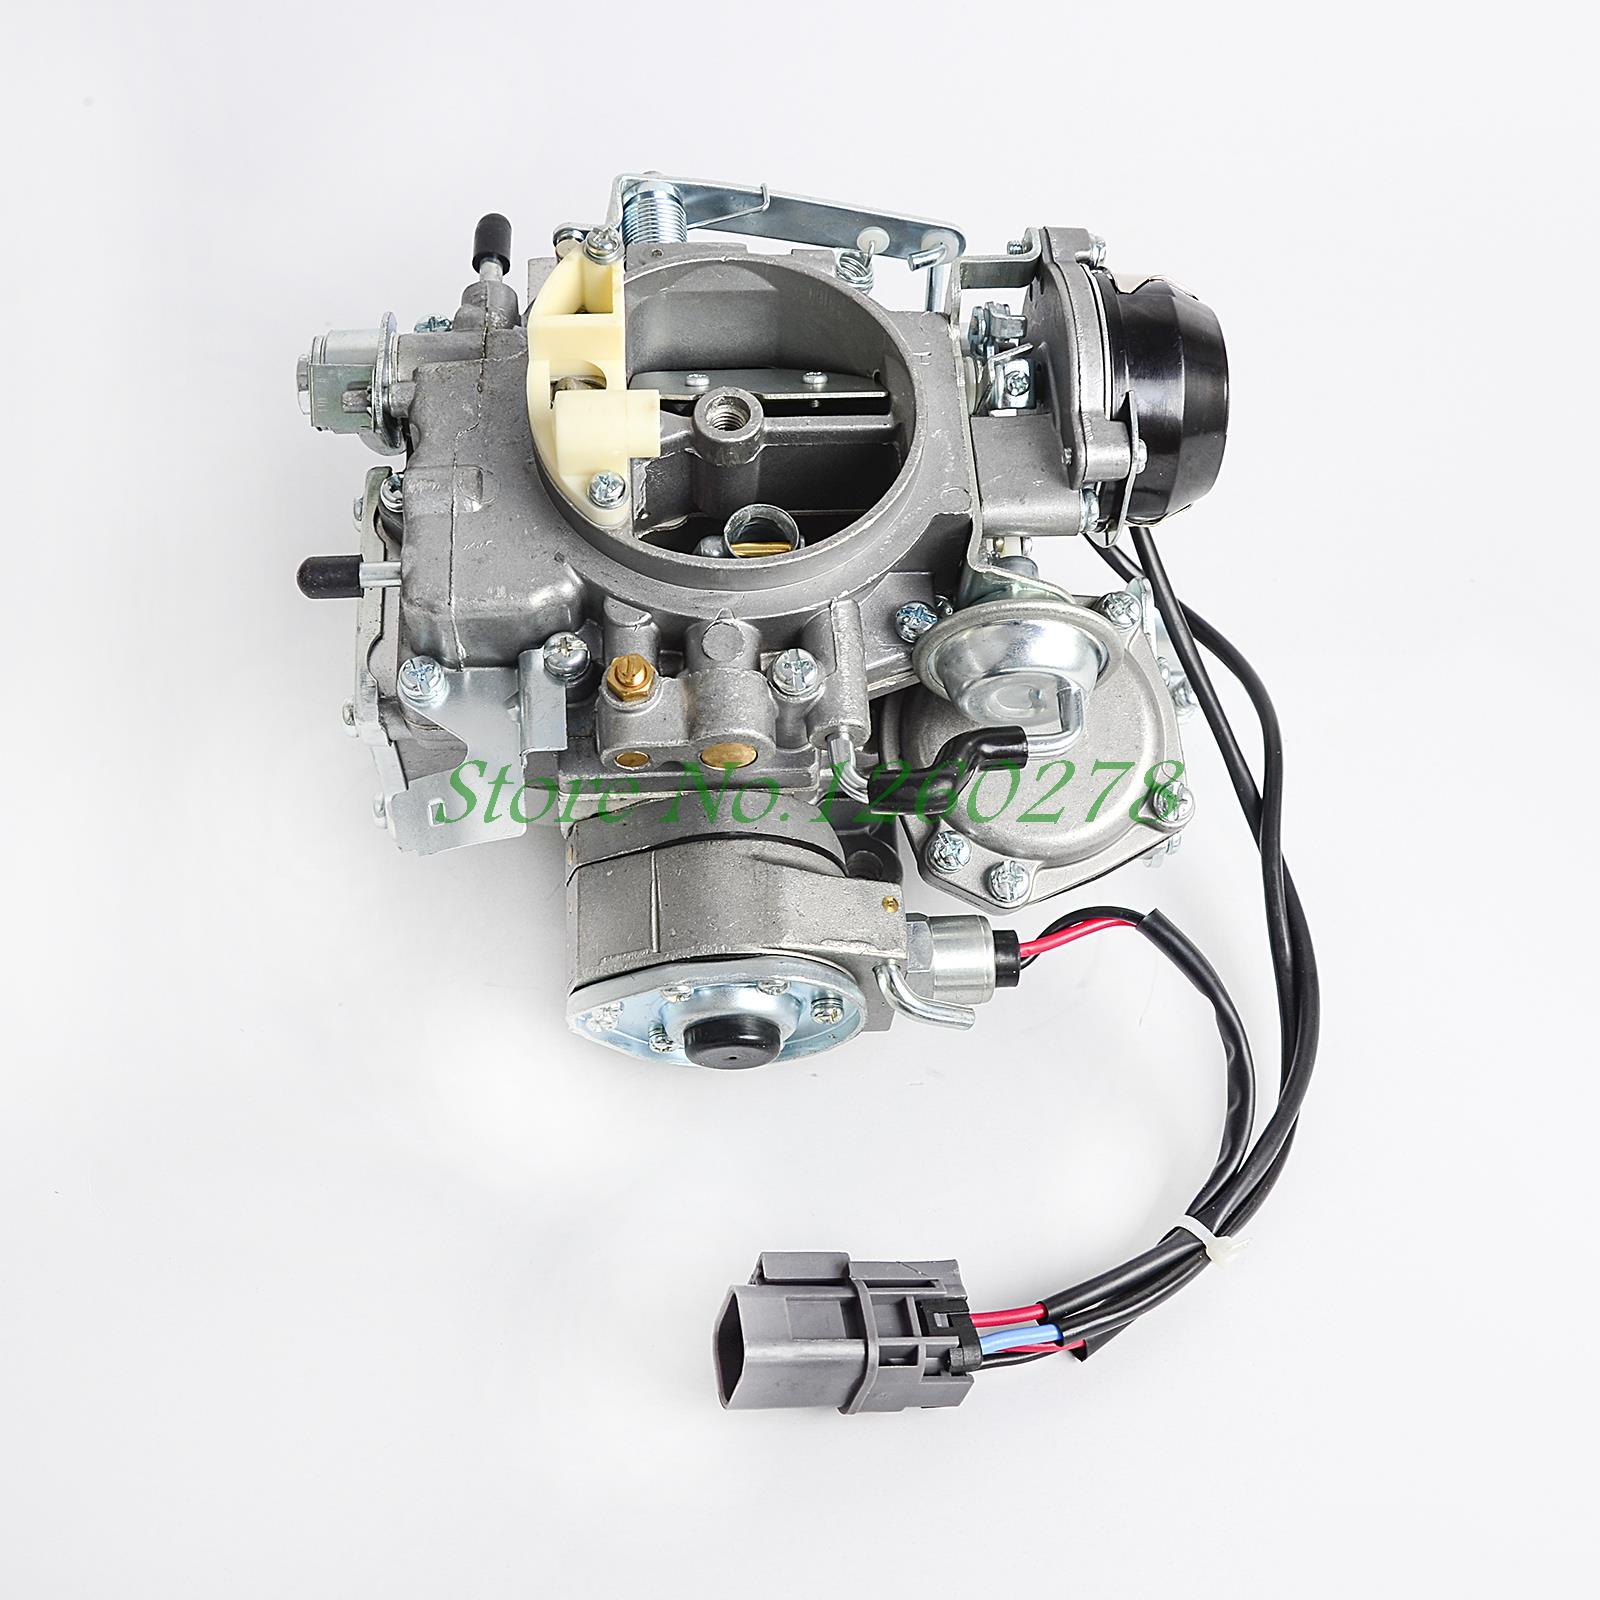 NICECNC CARBURETTOR CARBY CARBIE VERY RARE FOR NISSAN PATROL GQ Y60 6 Cylinders Engine TB42 4